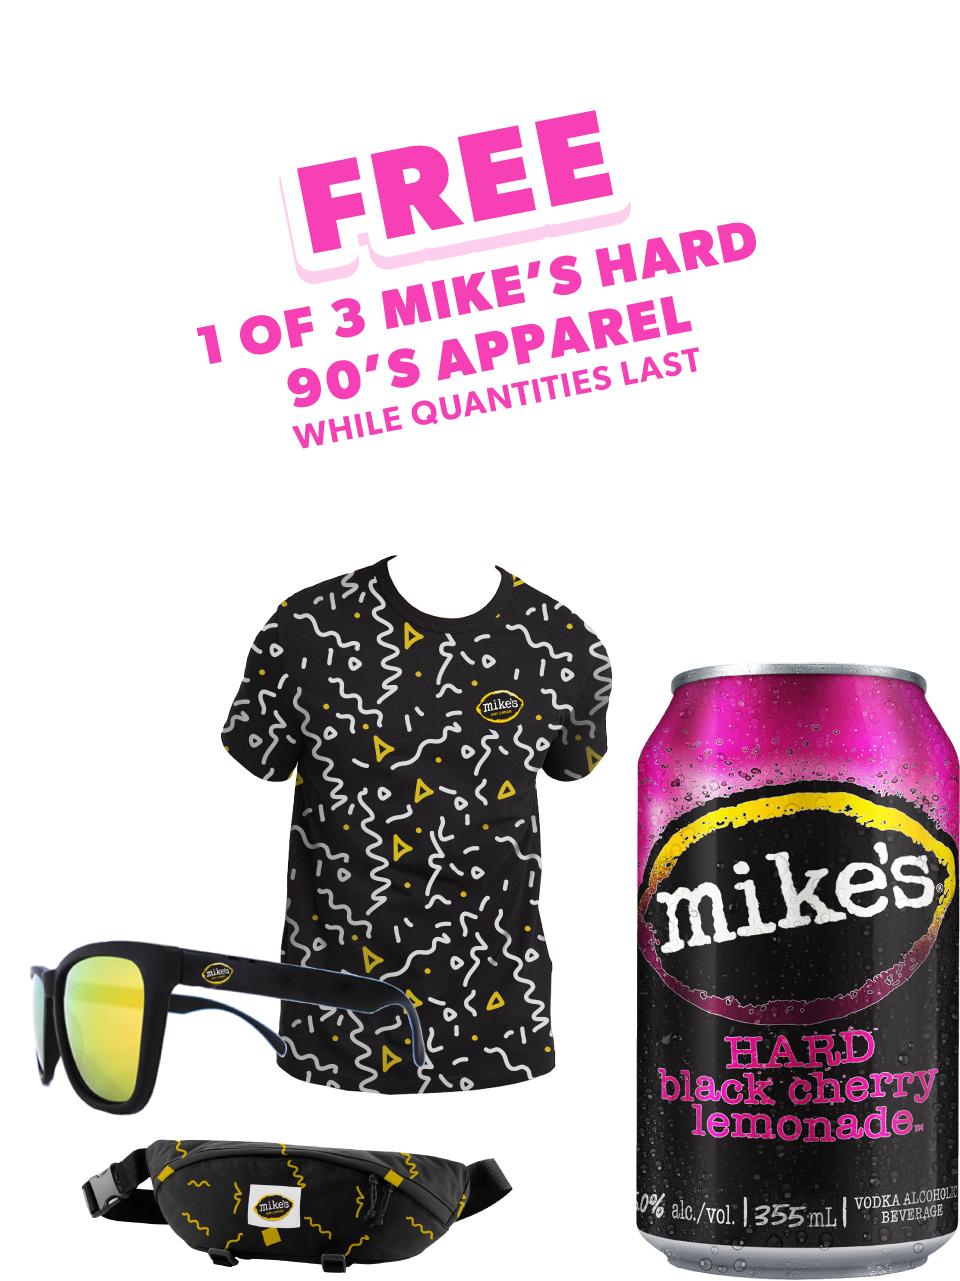 Mike's Hard Black Cherry Lemonade 6 Pack Cans